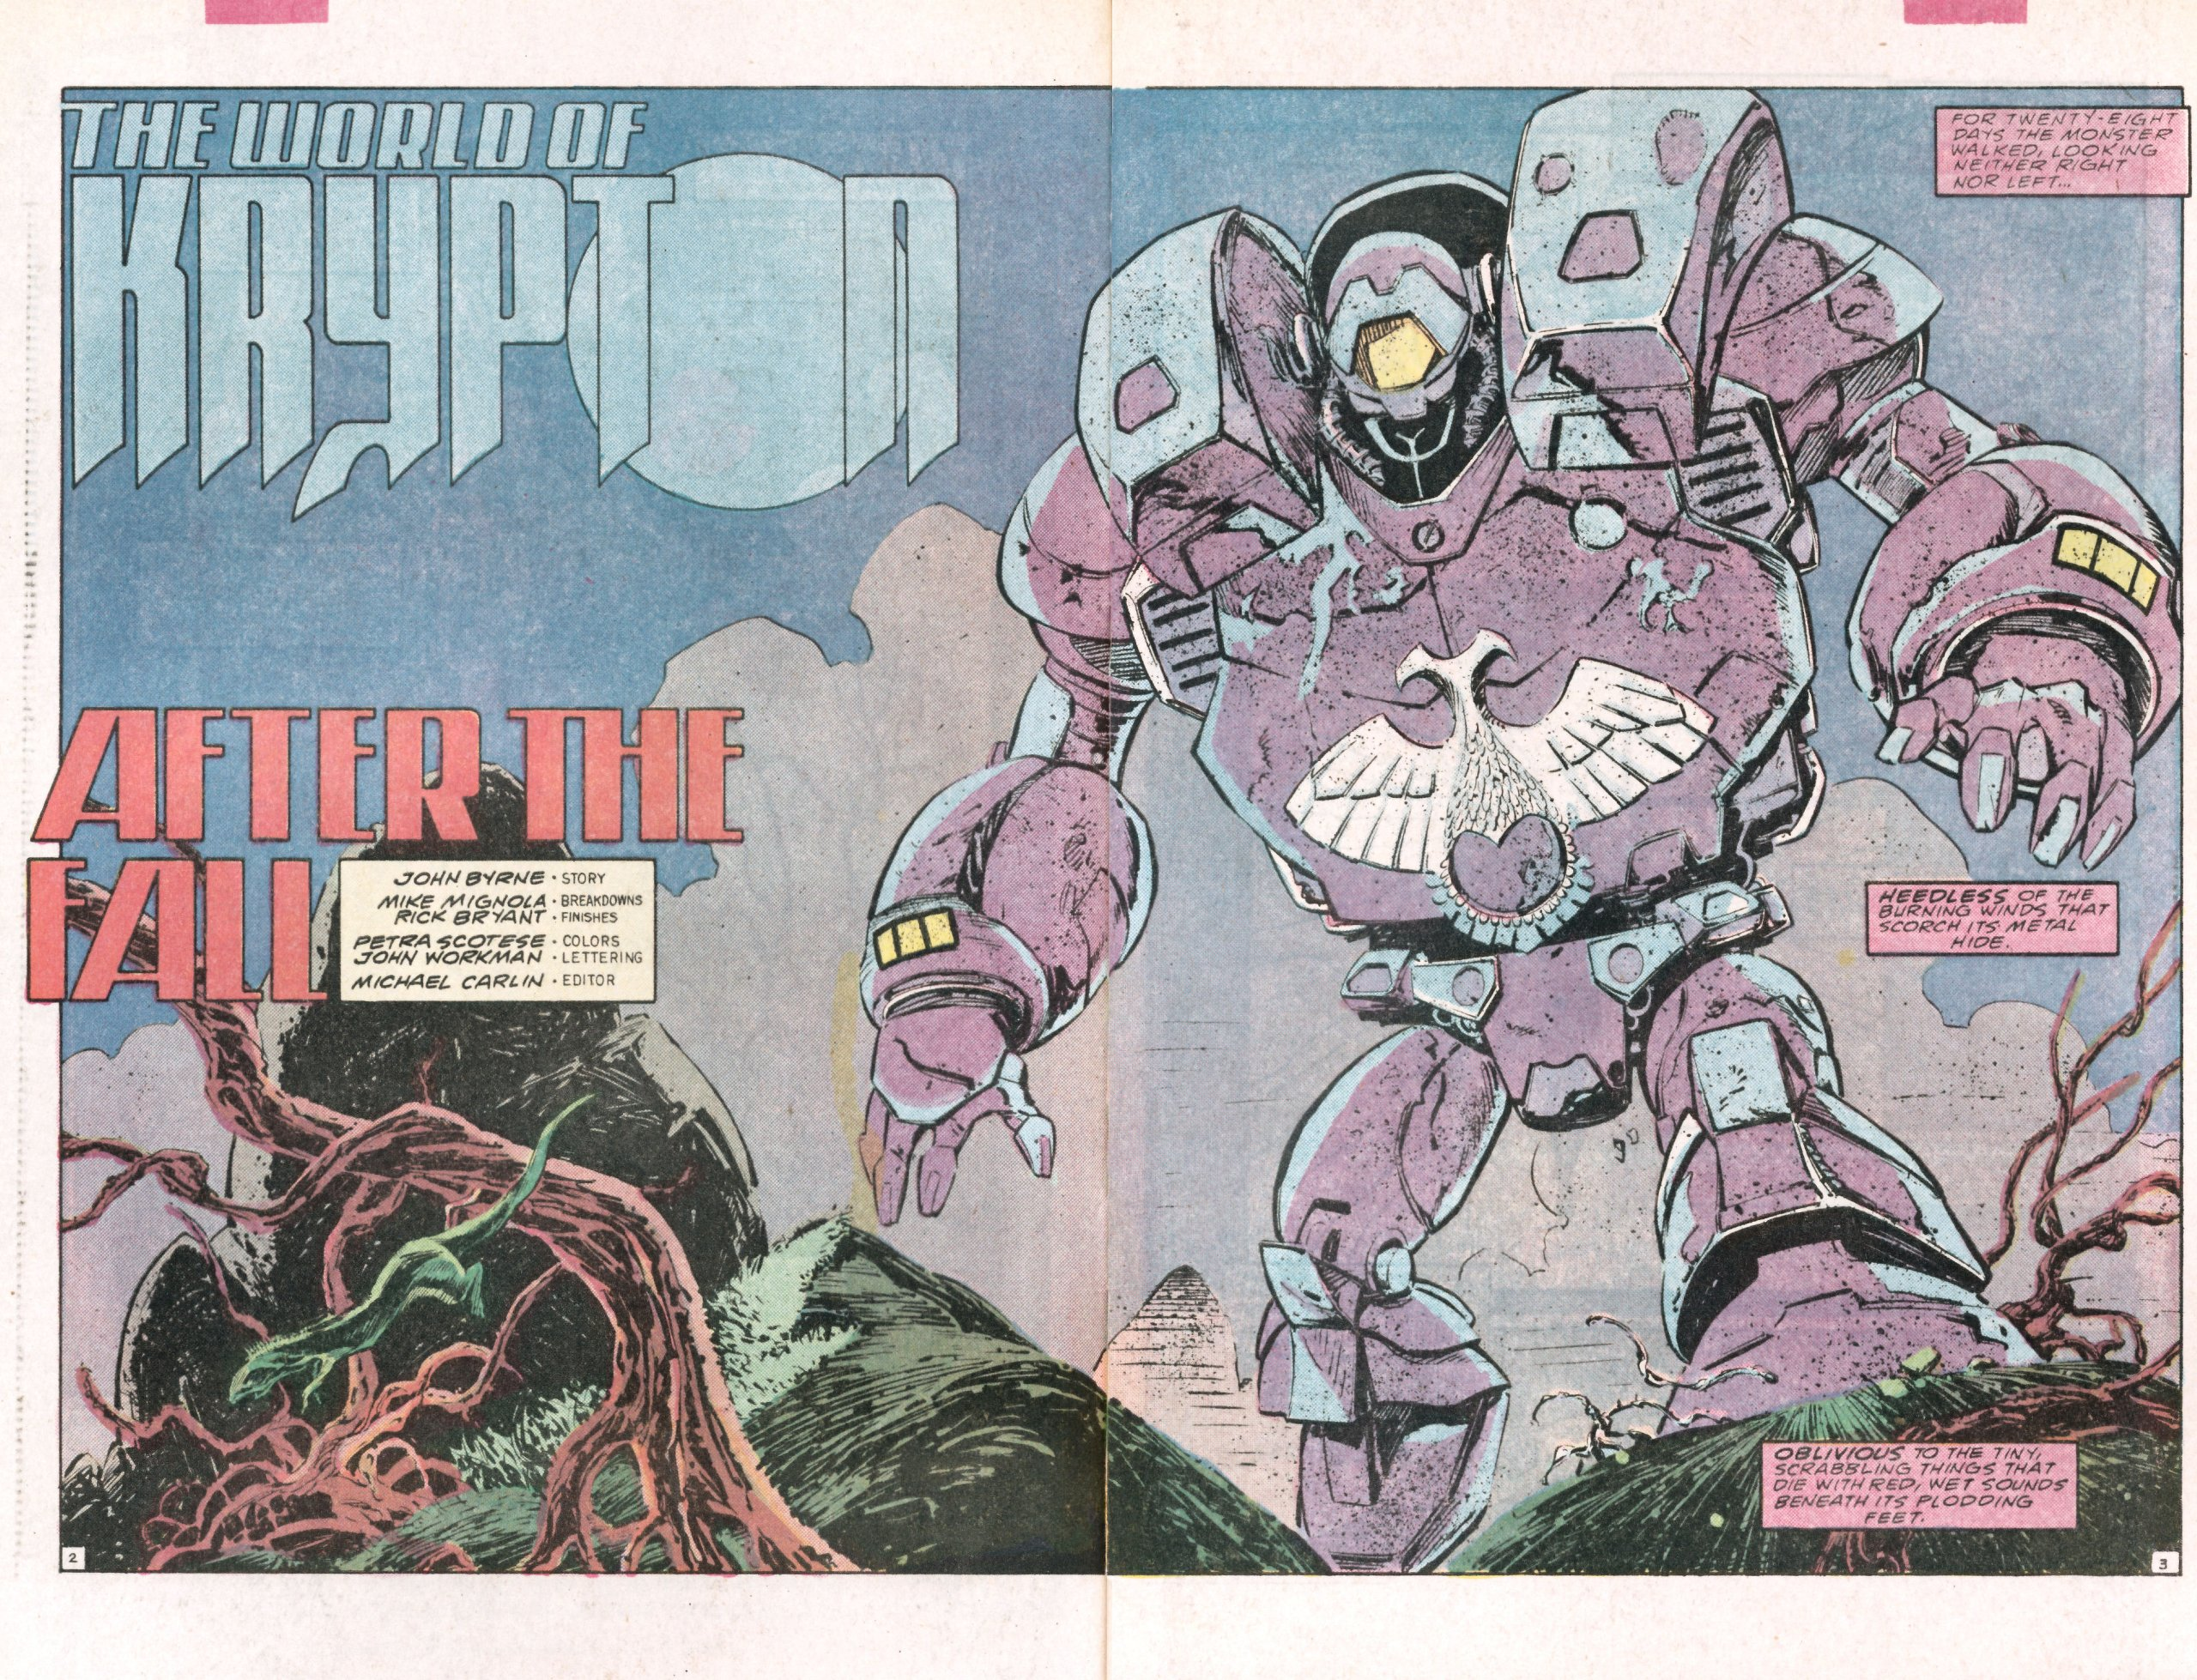 Read online World of Krypton comic -  Issue #2 - 6